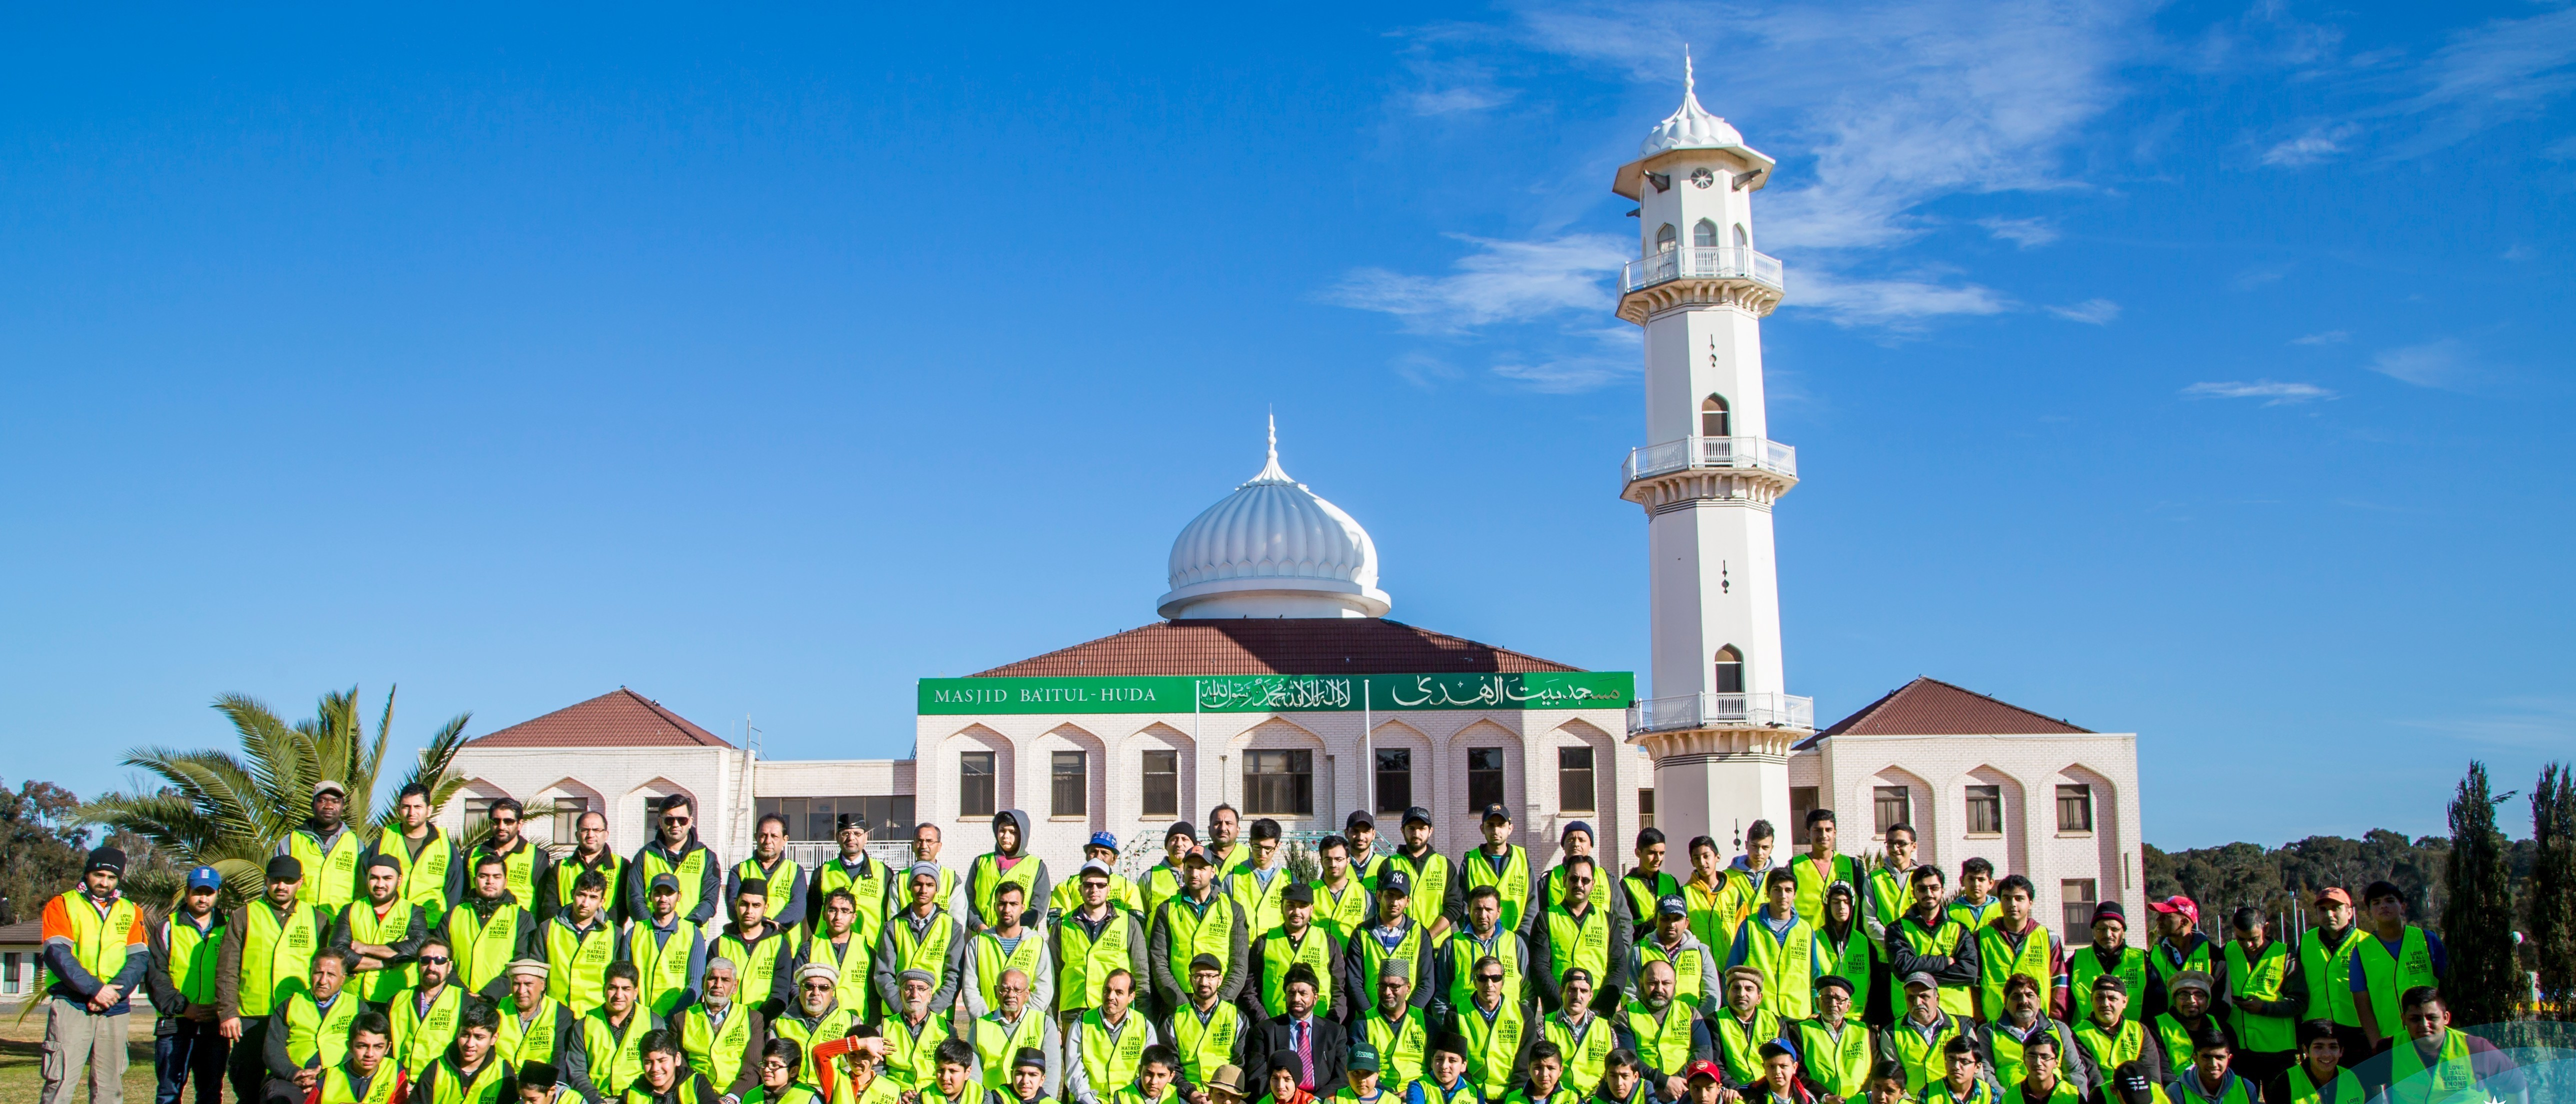 Ahmadi Muslims VIC - Dandenong Police Paddocks Reserve